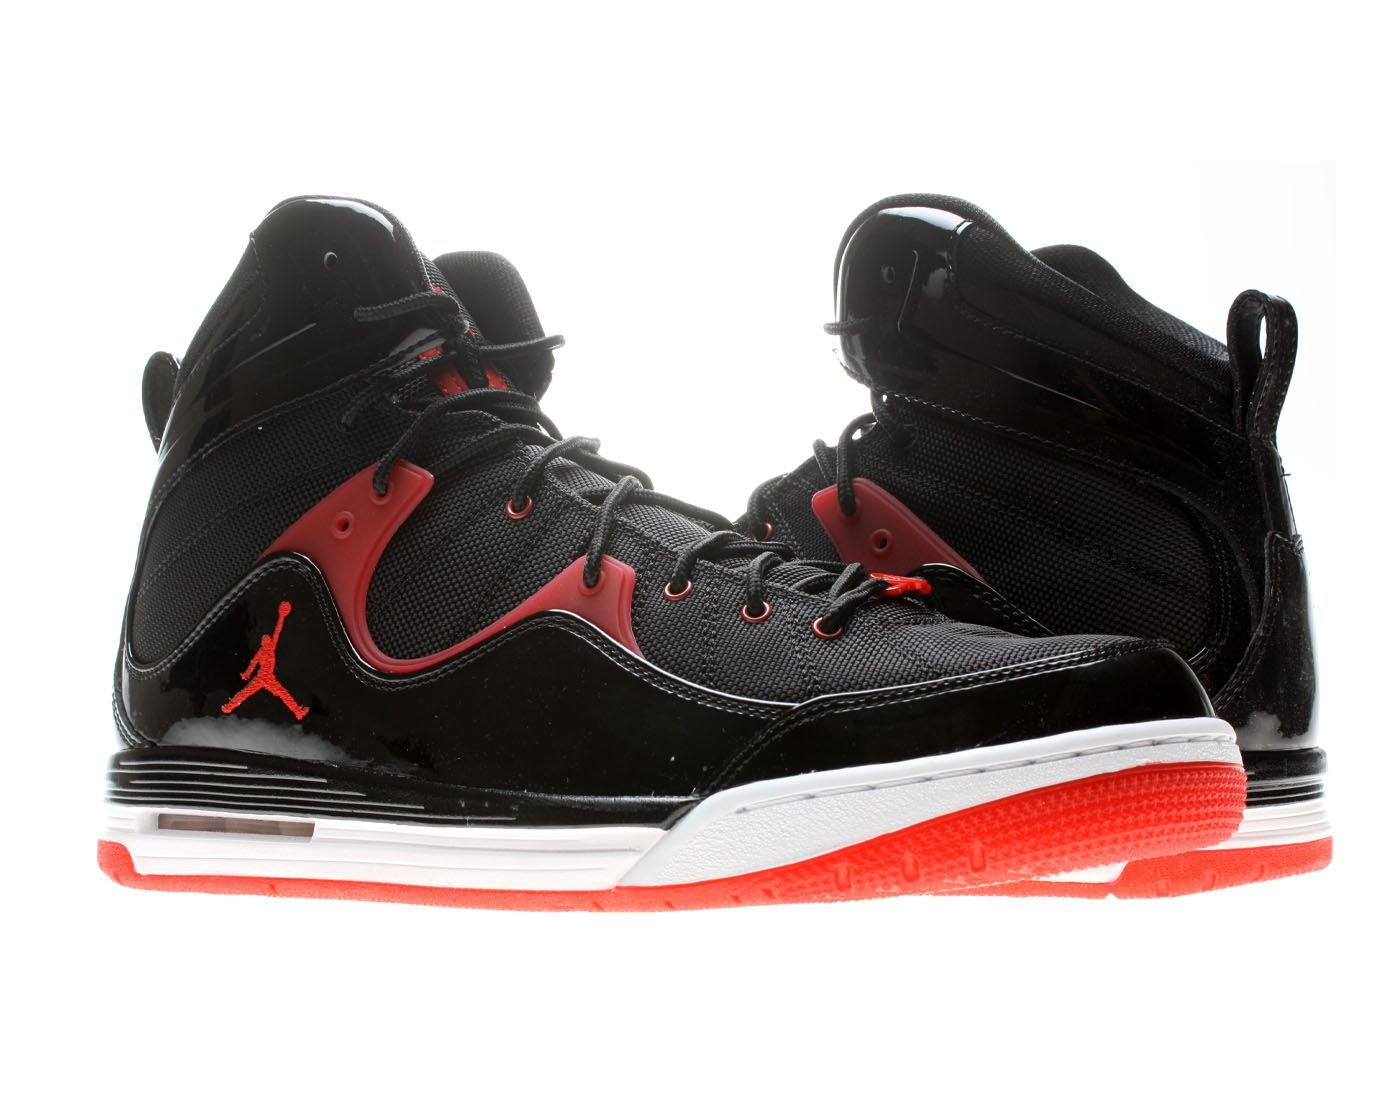 Nike Air Jordan Flight TR 97 Size 10 Men's Basketball Shoes White